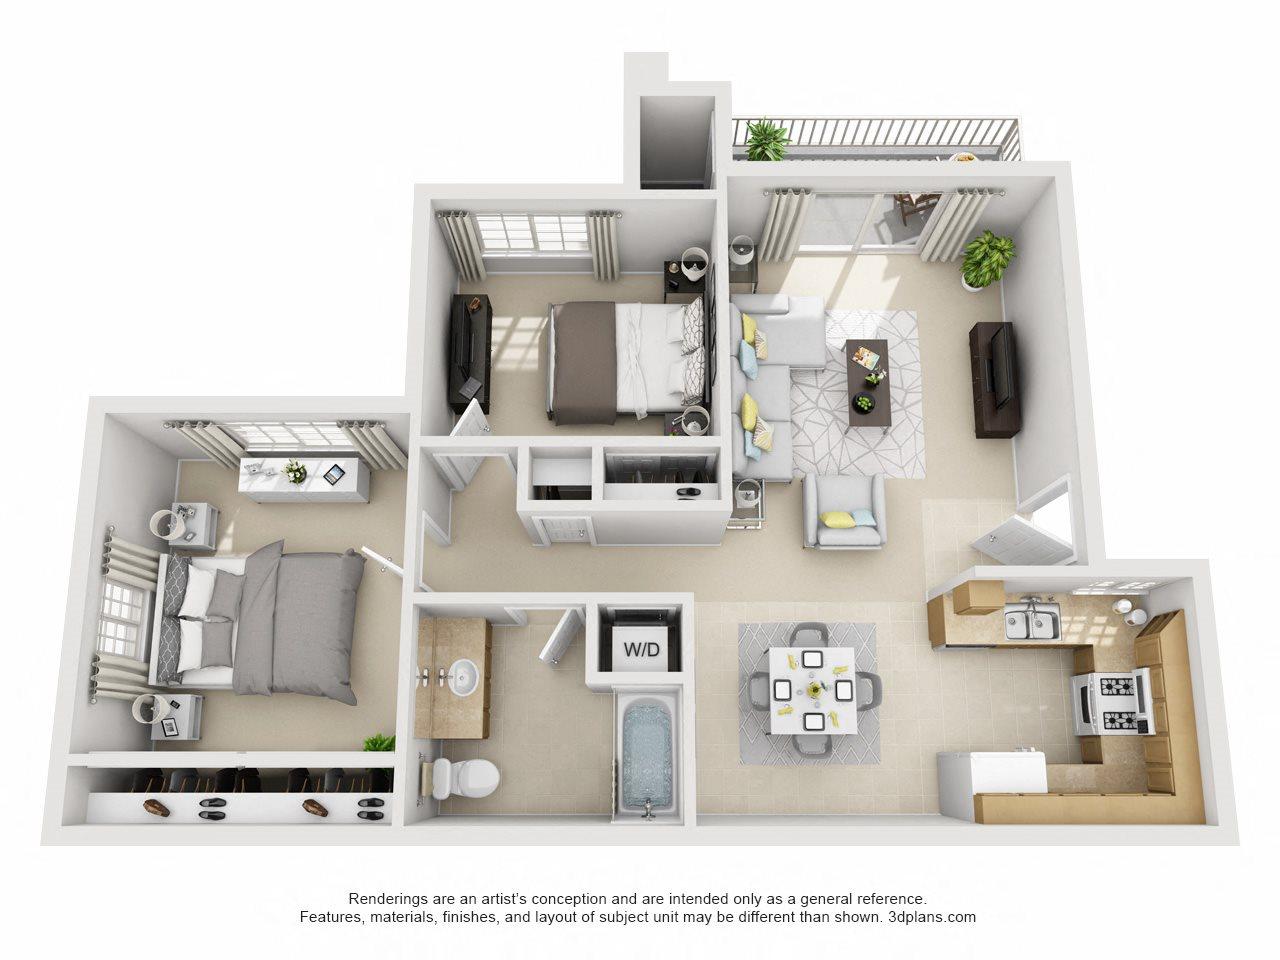 2 Bedroom, 1 Bath Downstairs Floor Plan 3